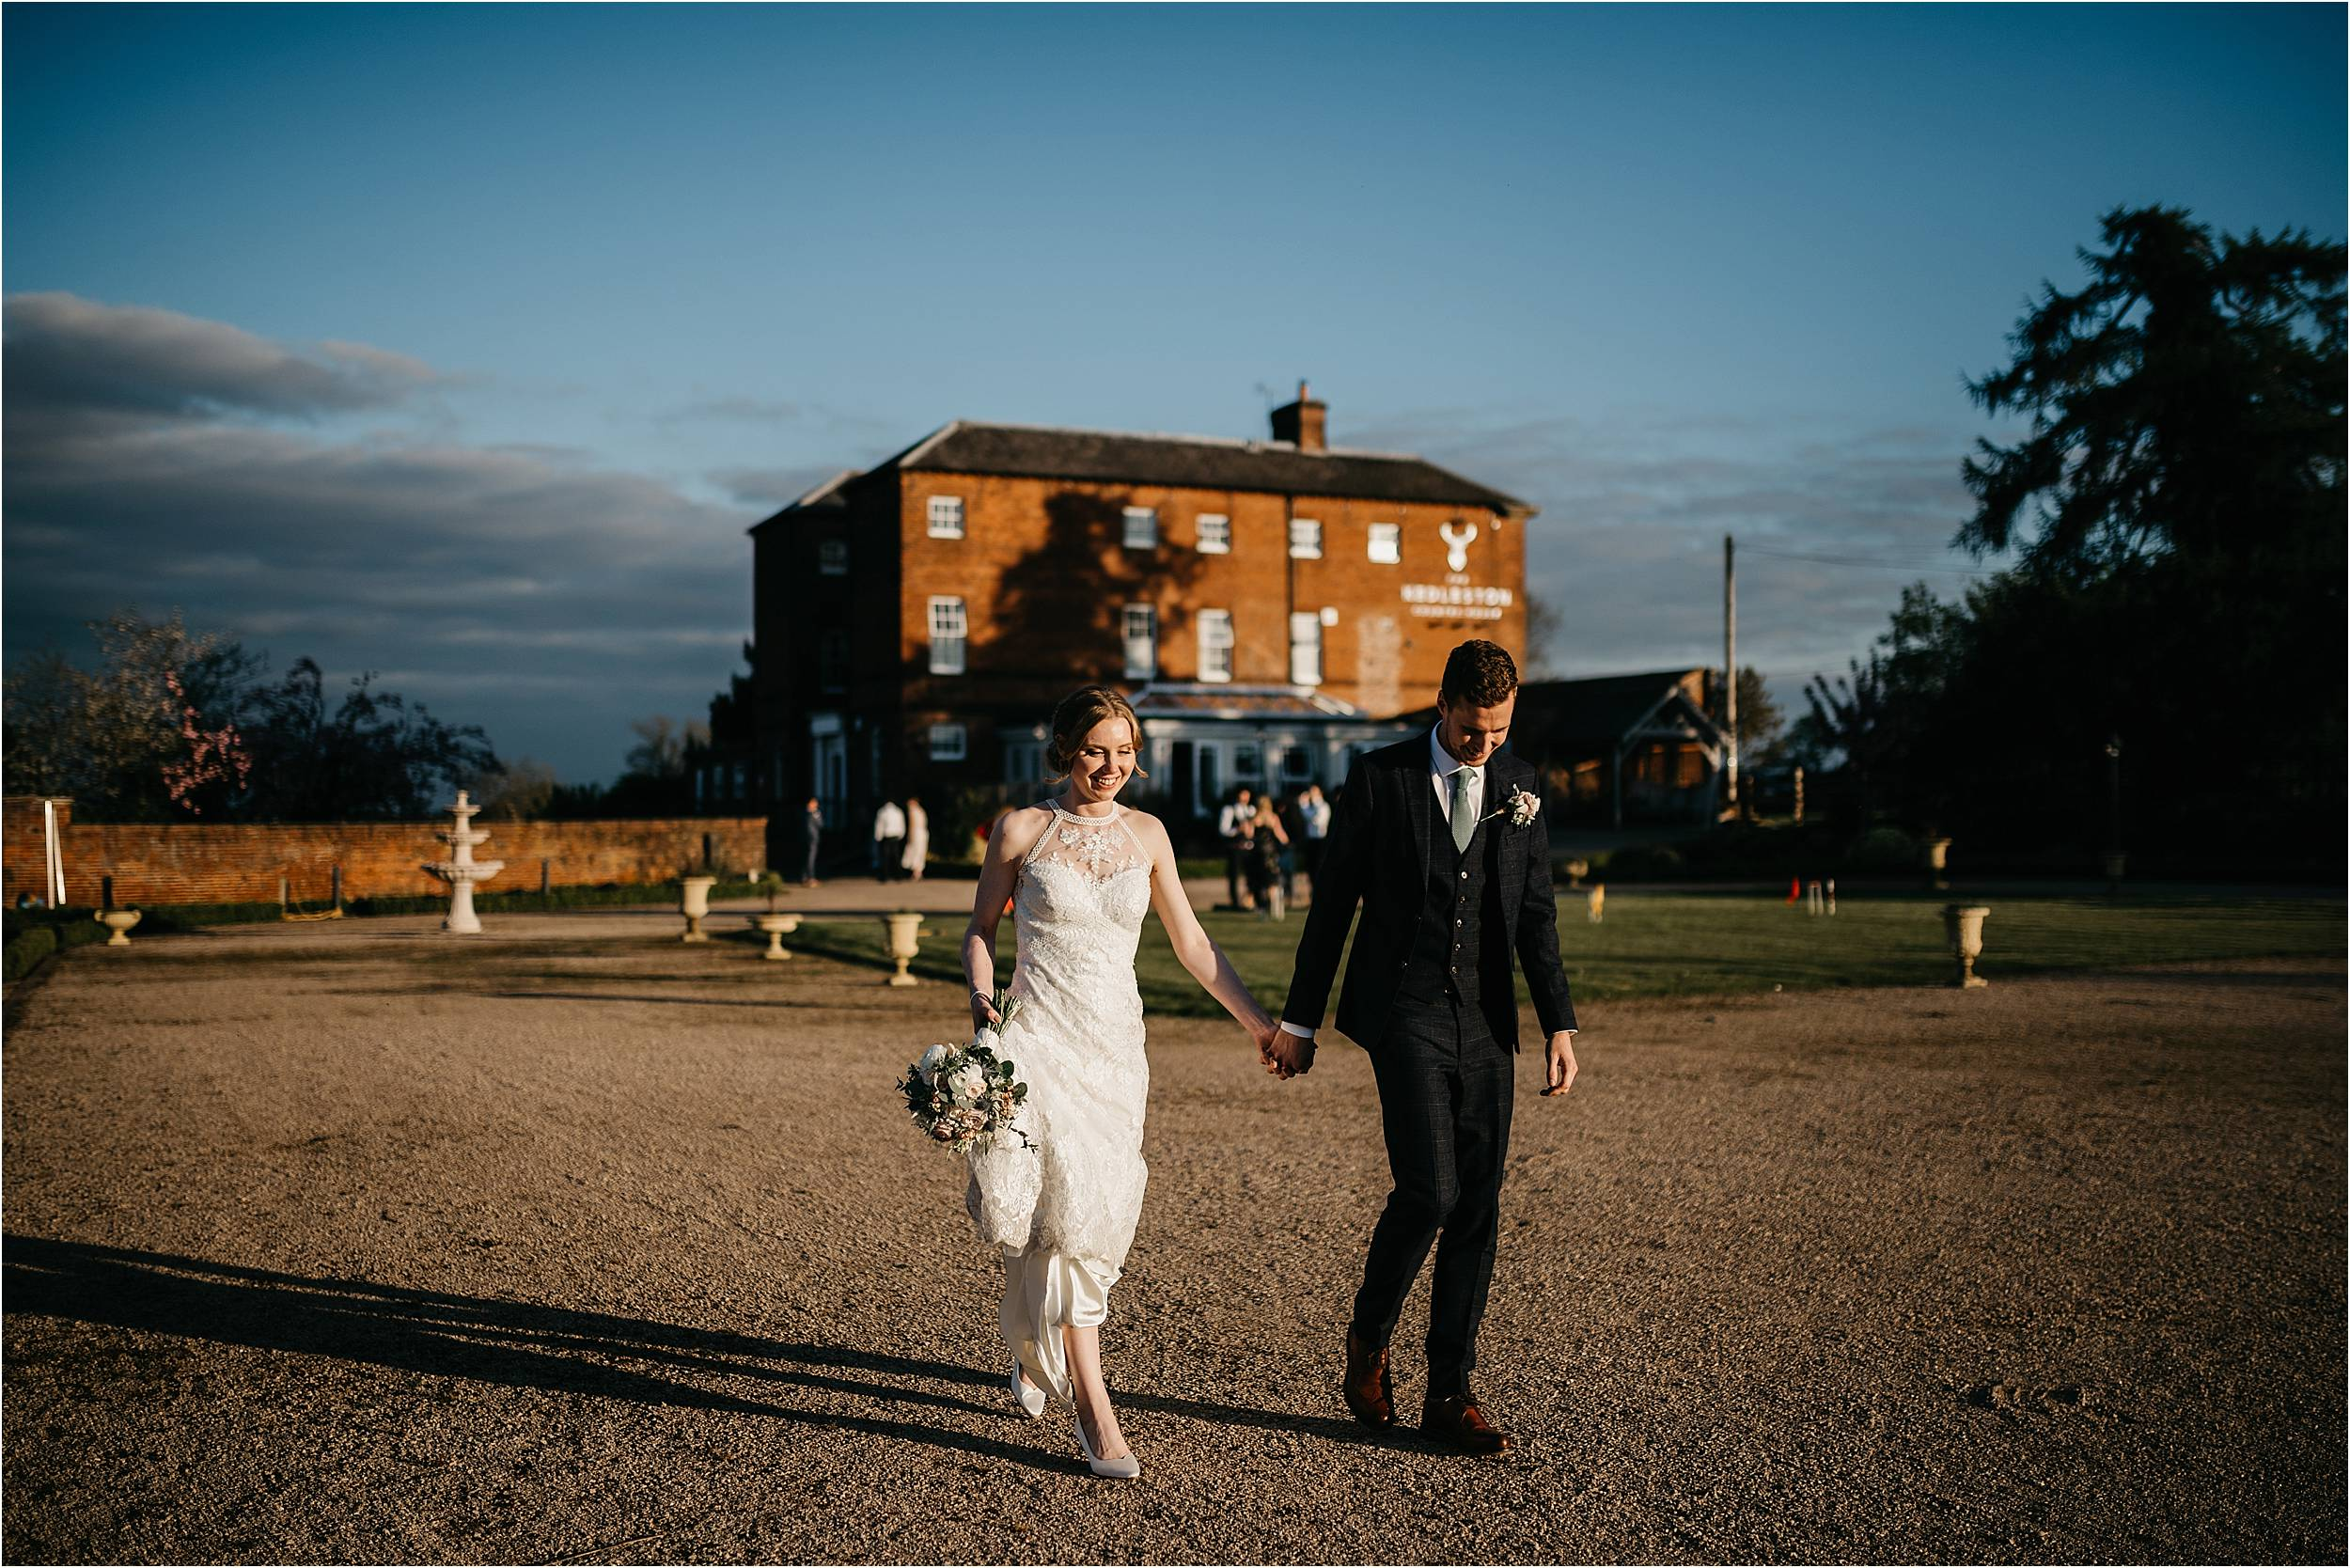 Kedleston Country House Wedding Photography_0095.jpg